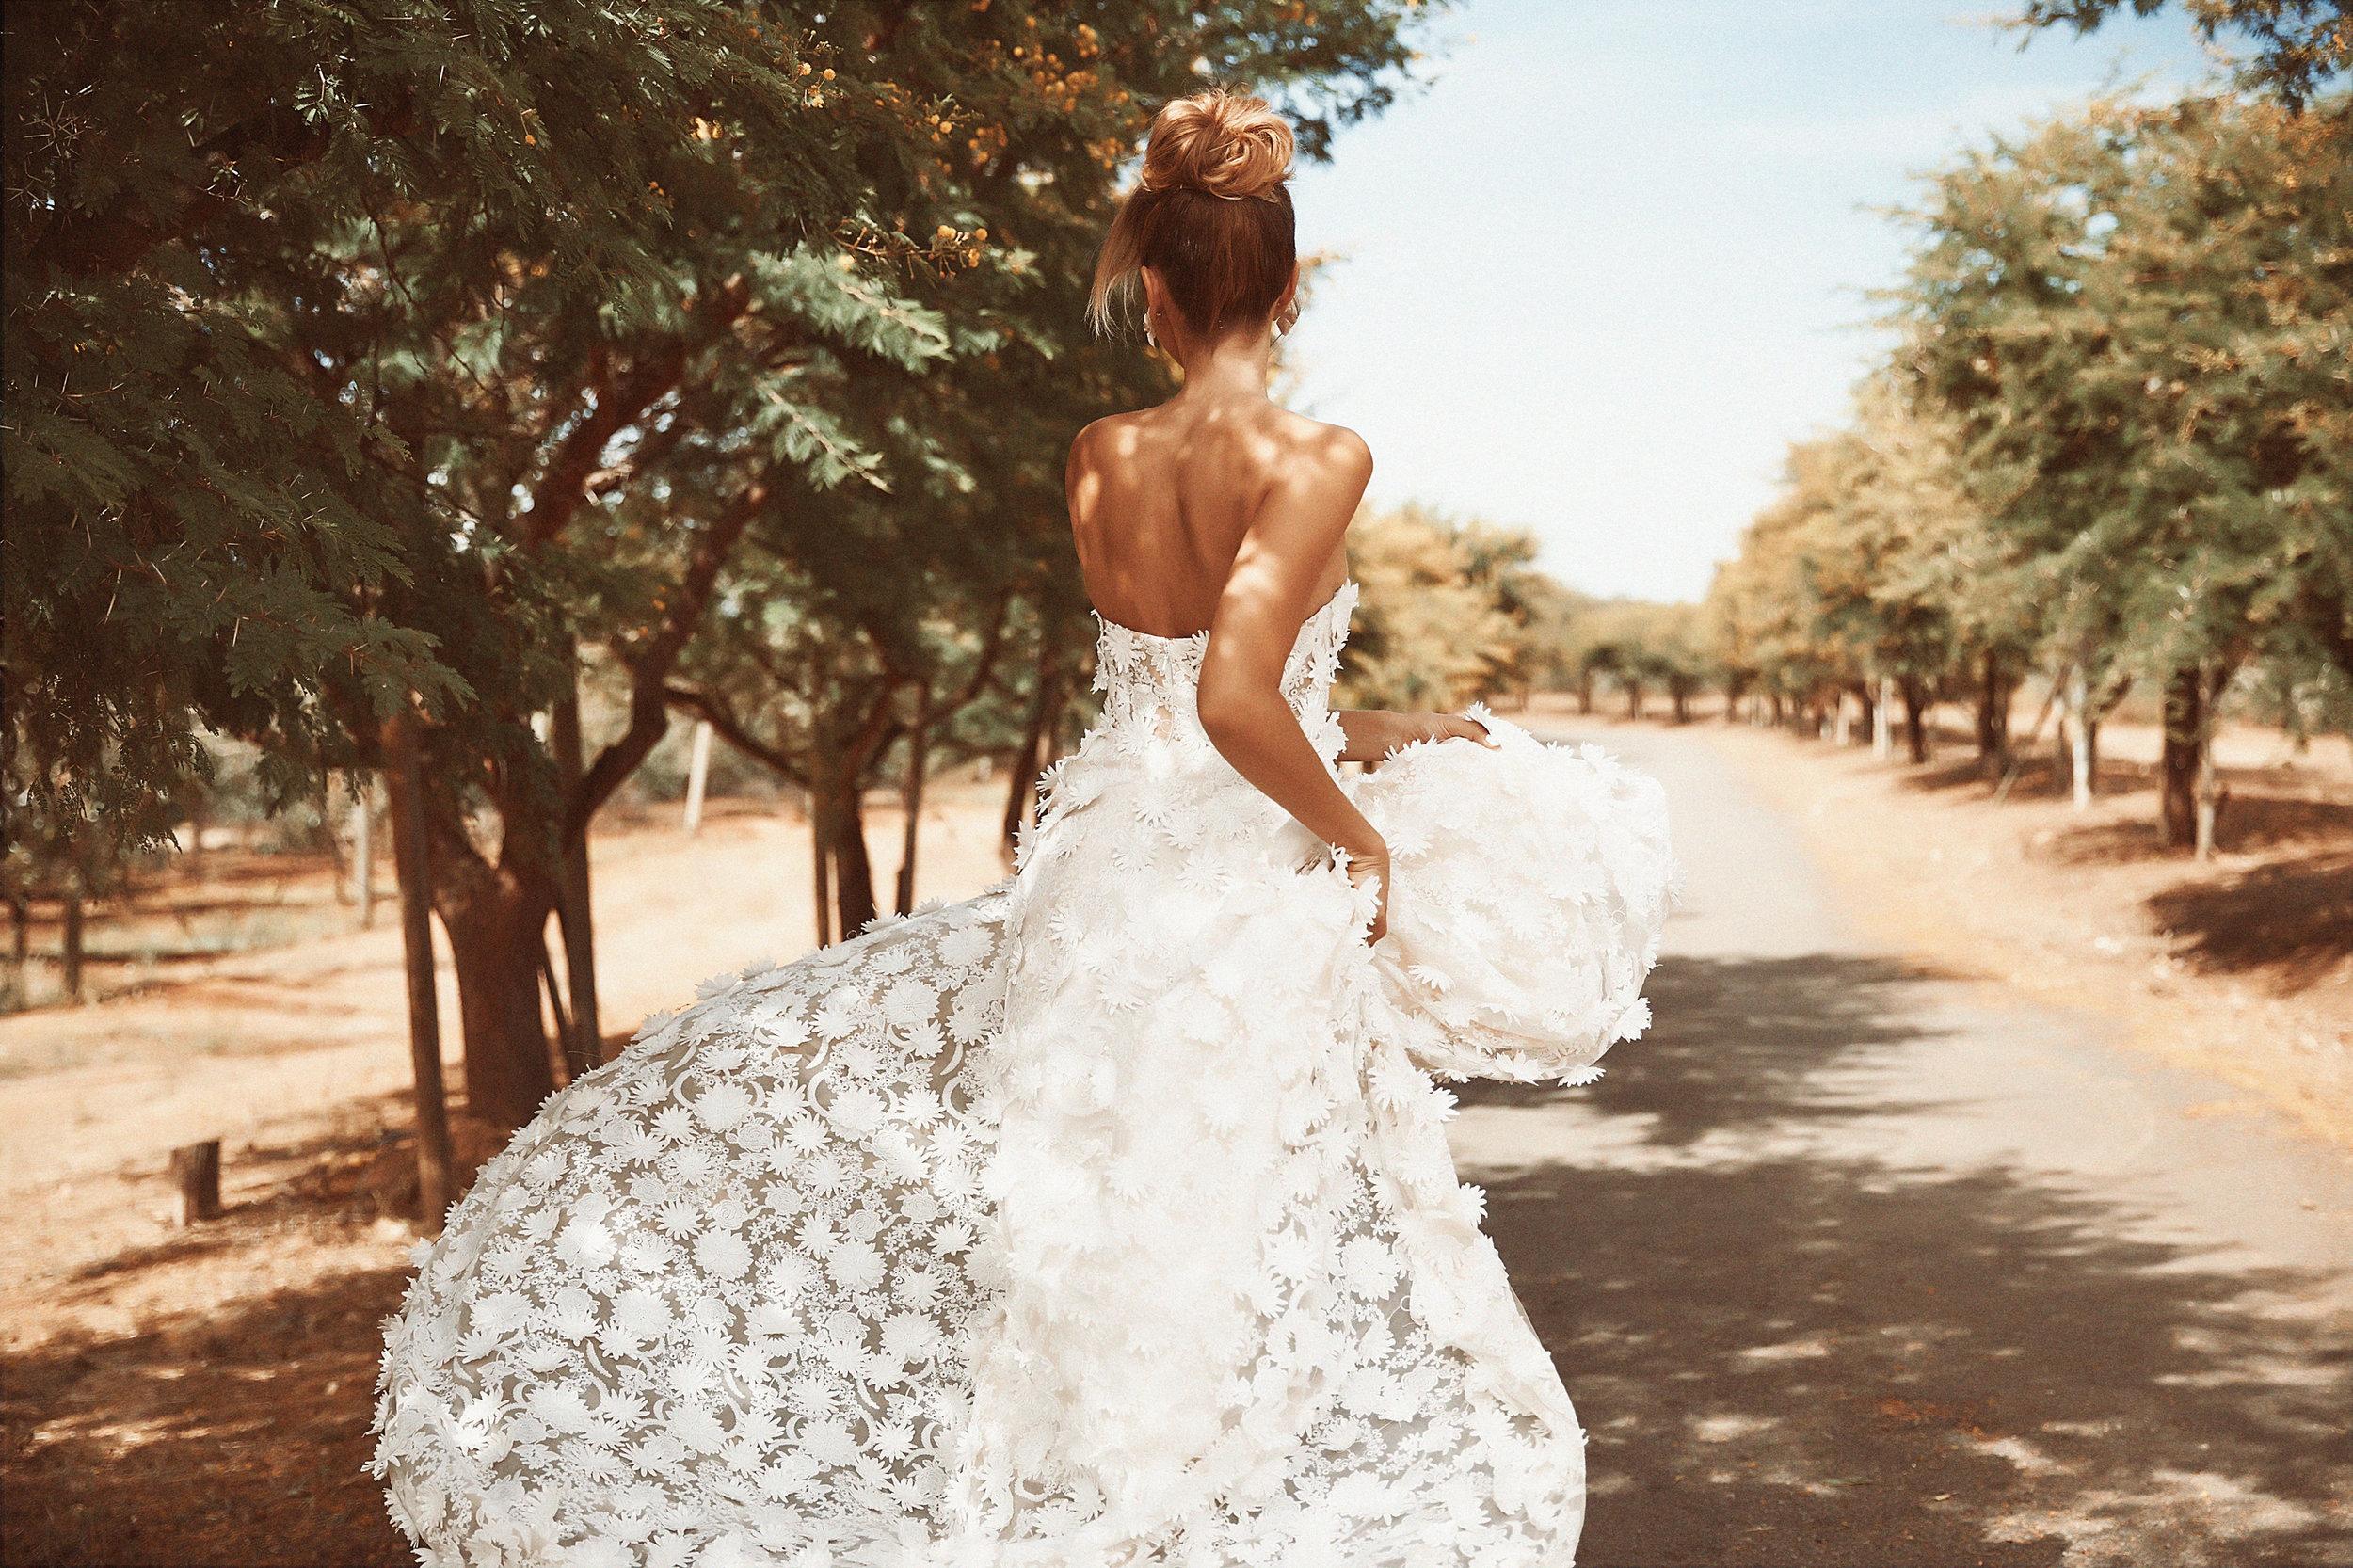 vagabond bridal ireland